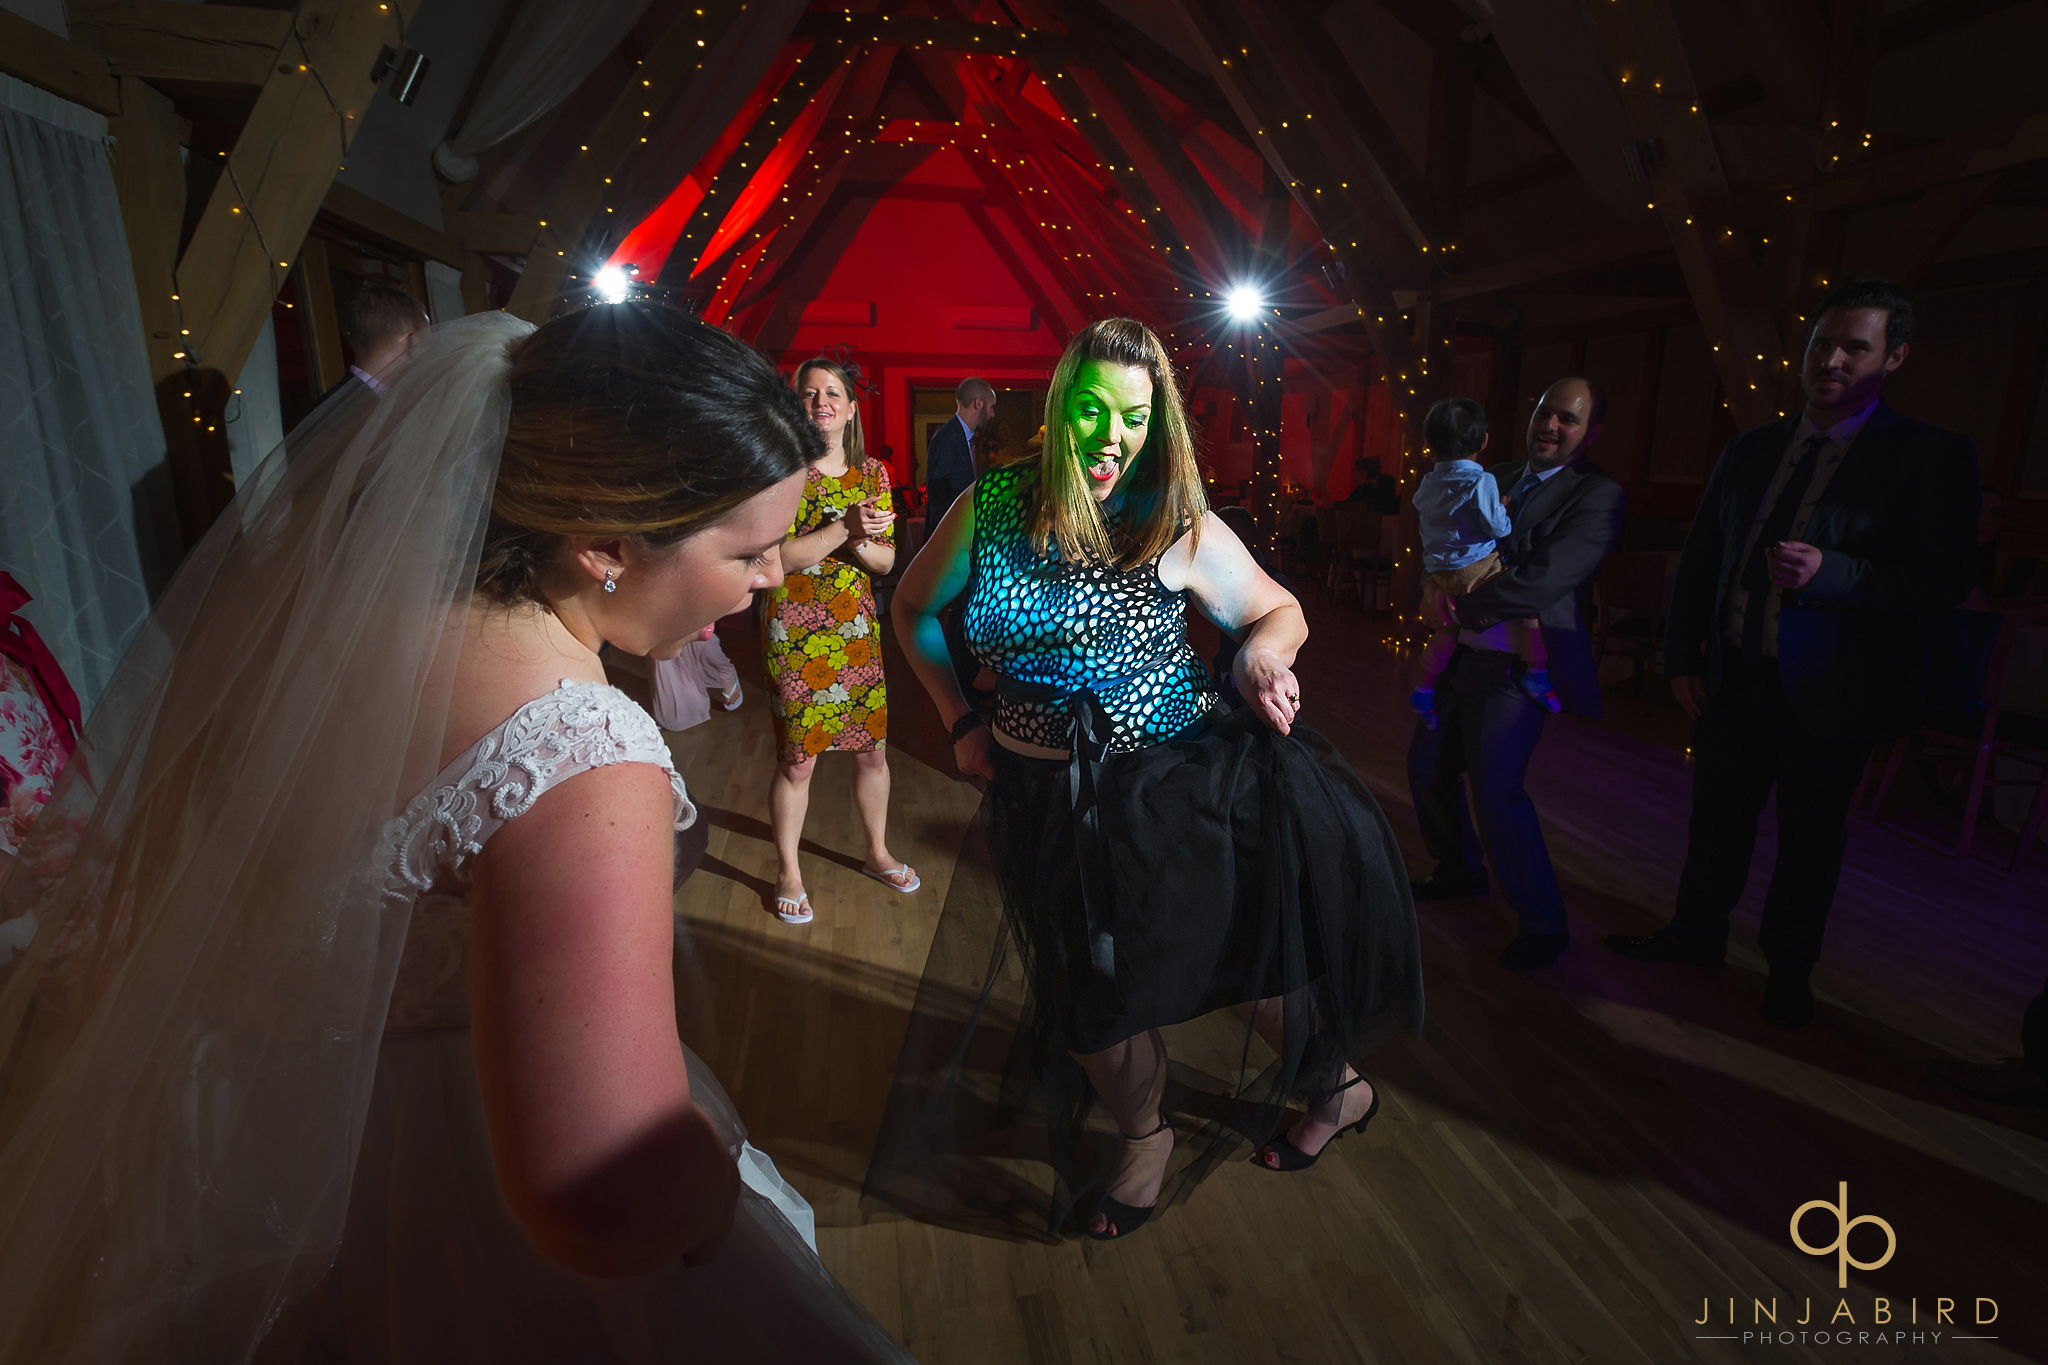 guest-dancing-with-bride